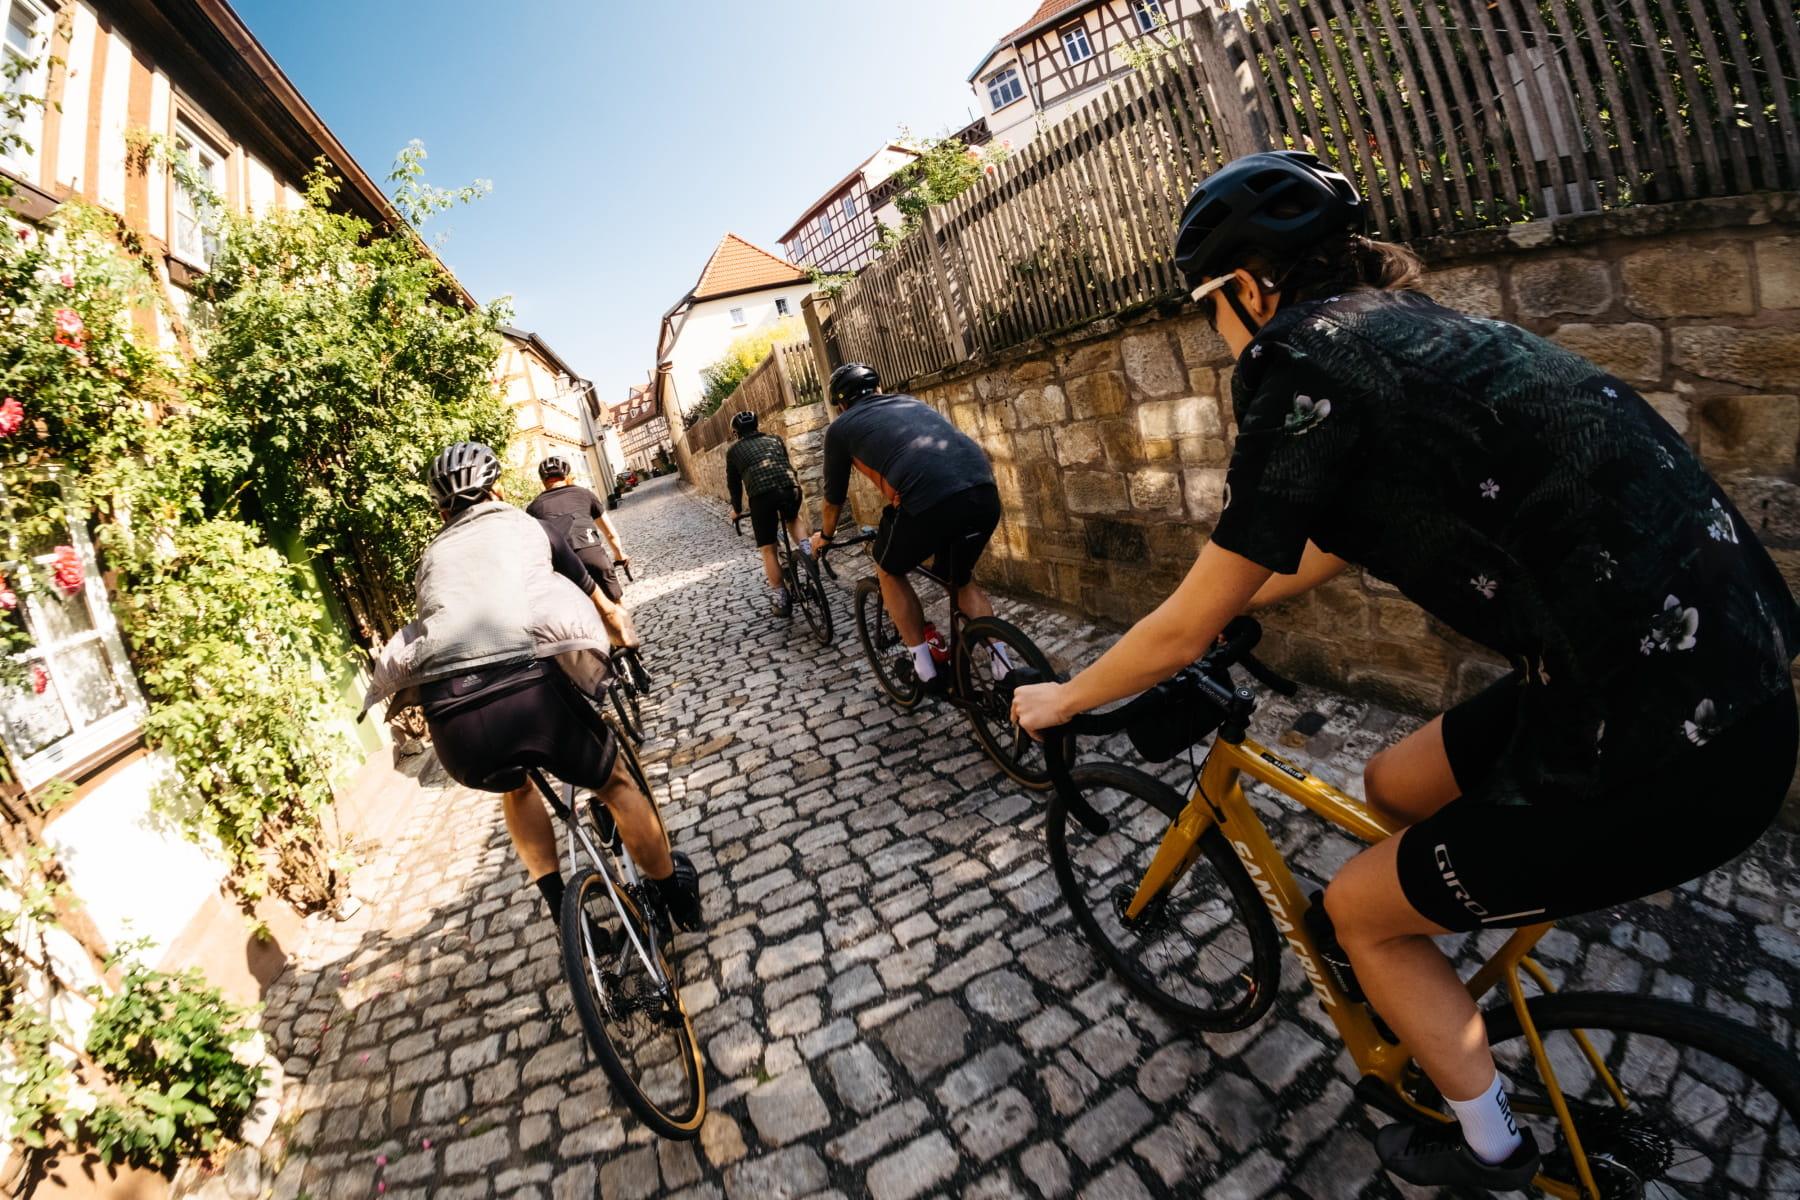 Material-Hassberge-Copyrigh-GRAN-FONDO-Cycling-Magazin-016